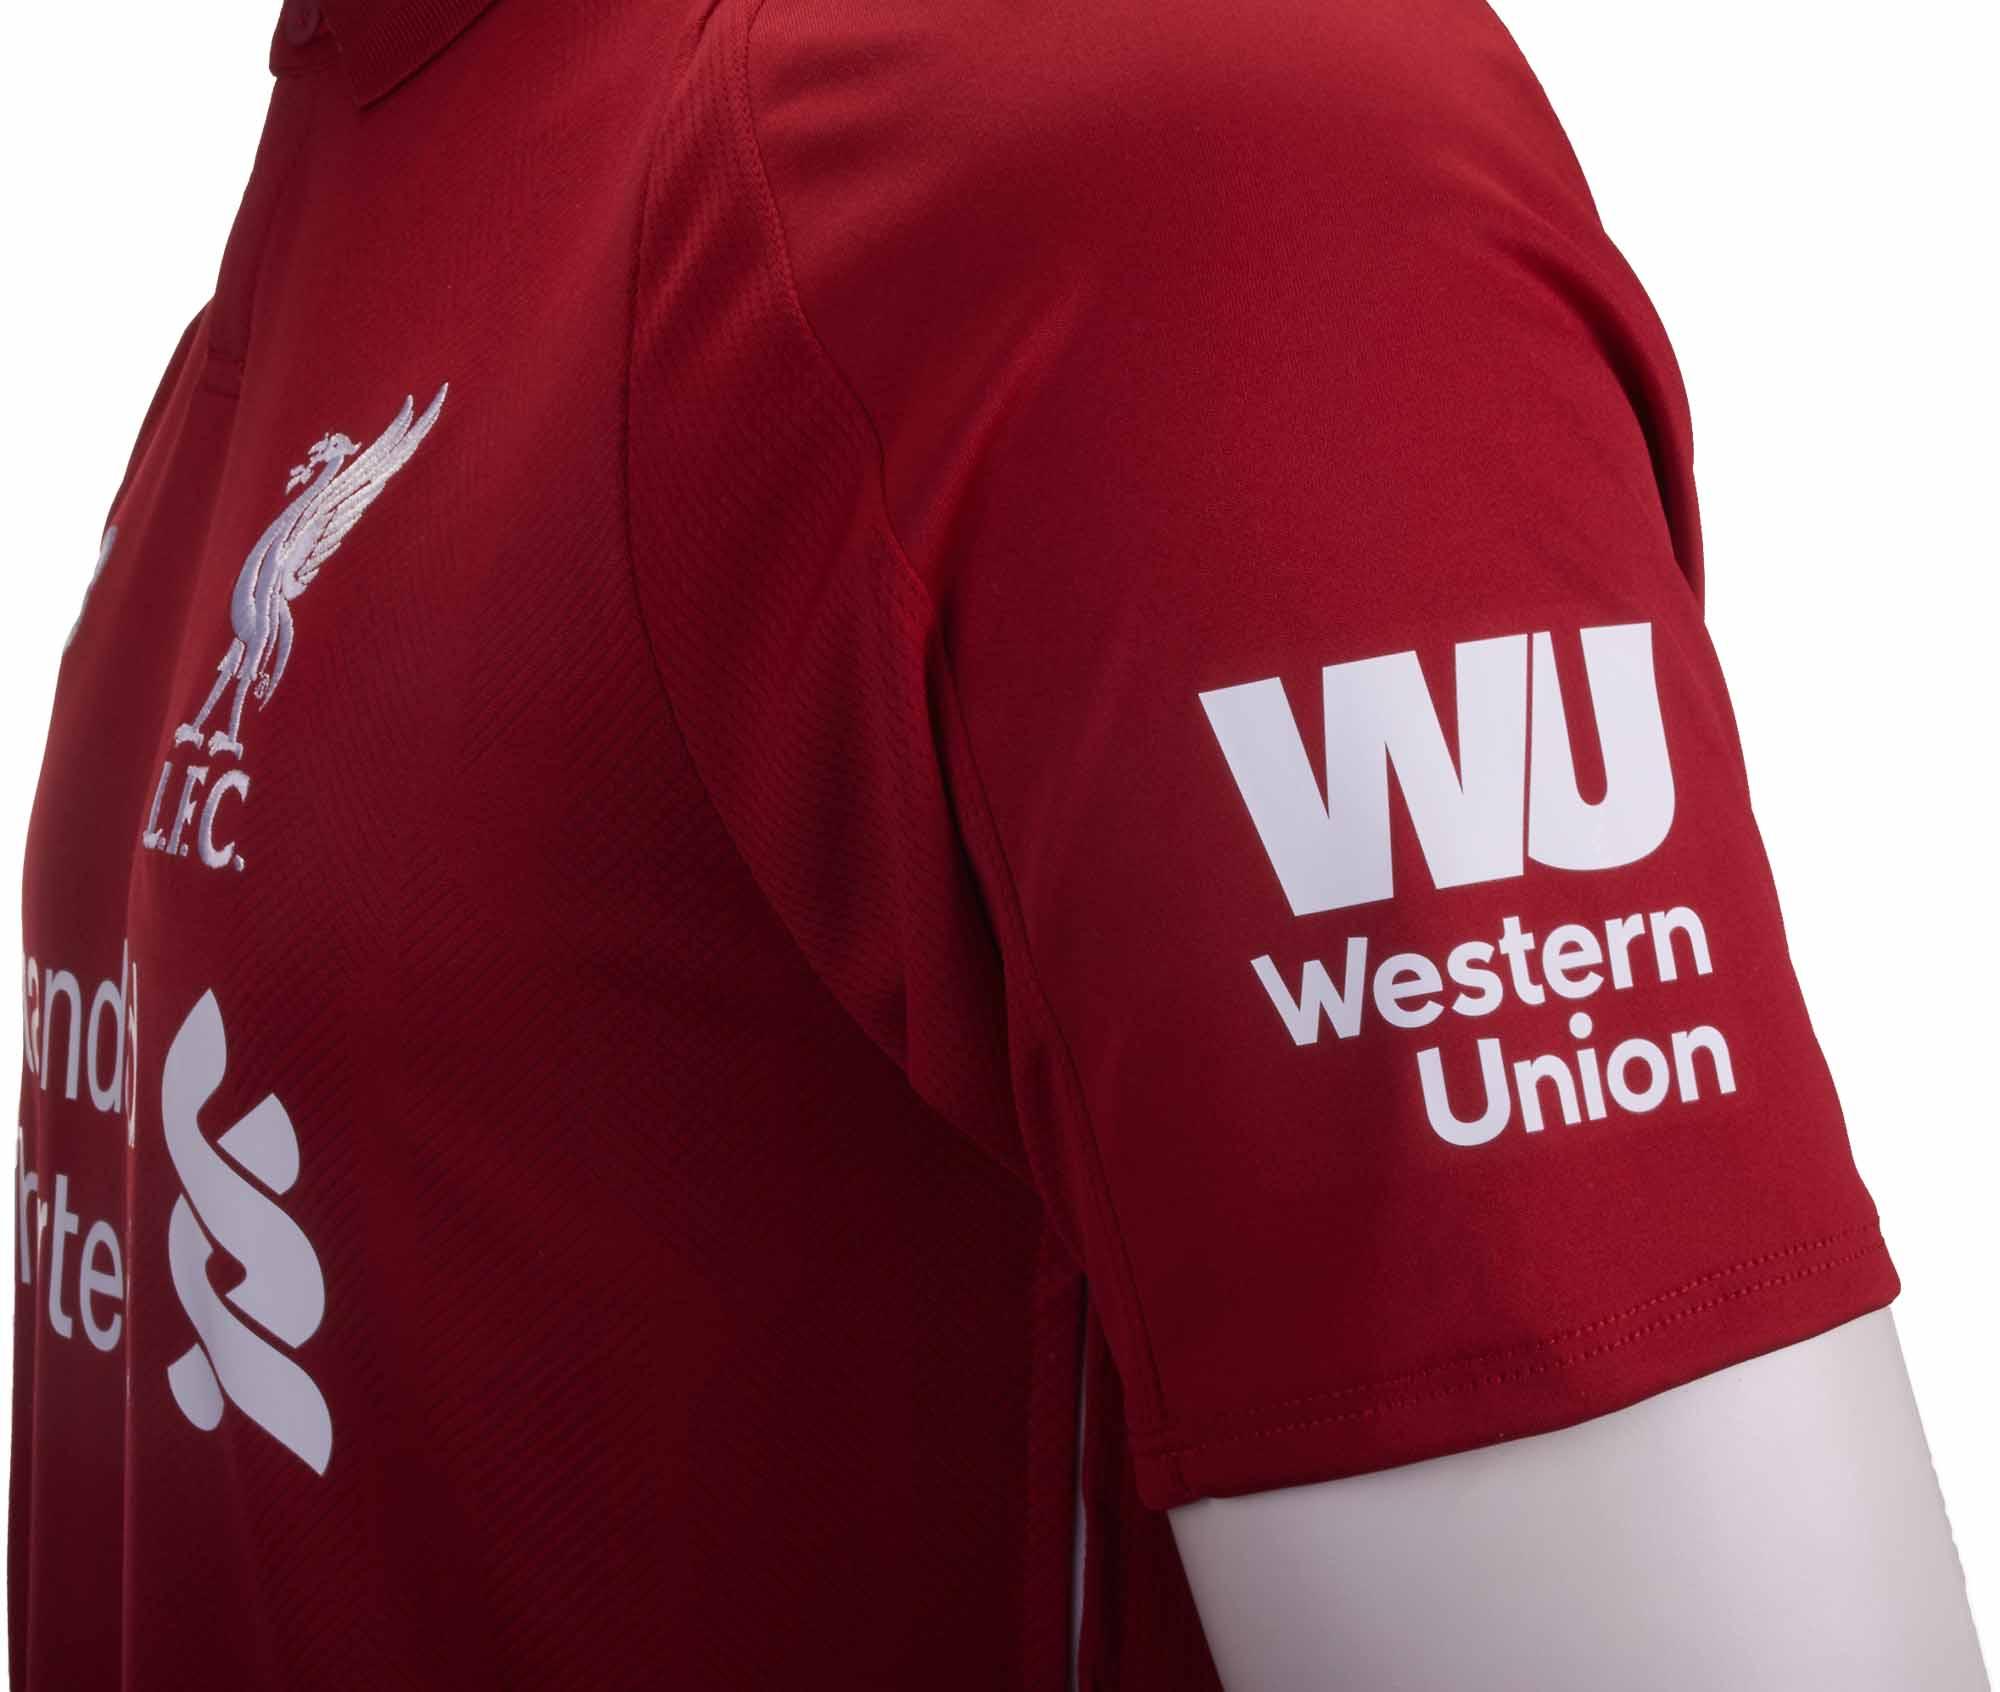 2018 19 new balance liverpool home jersey soccerpro new balance liverpool home jersey